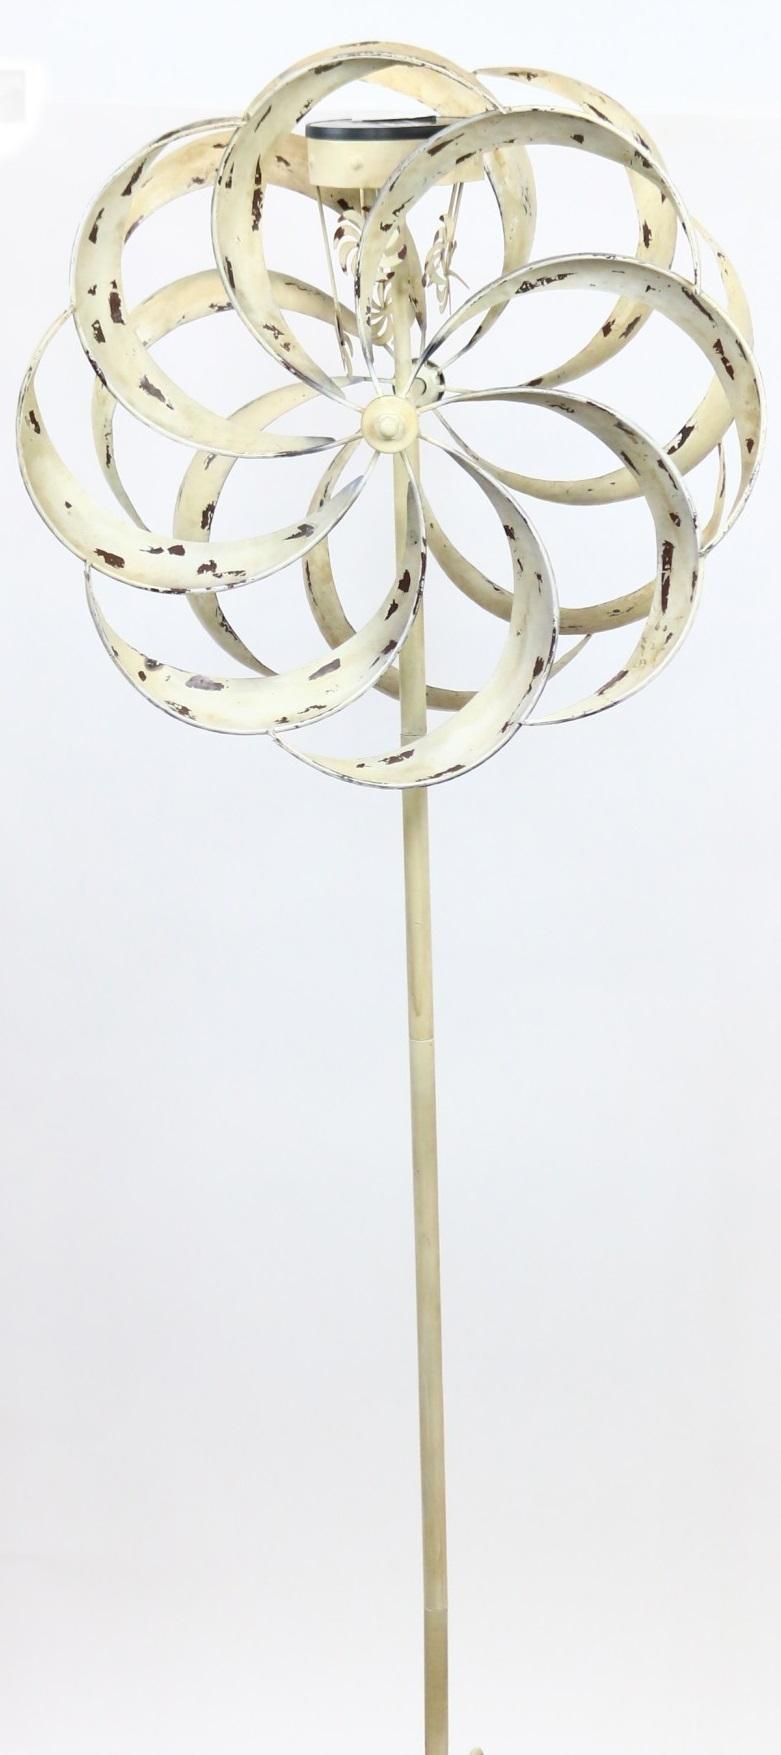 Solar White Windmill Garden Stake by Benzara